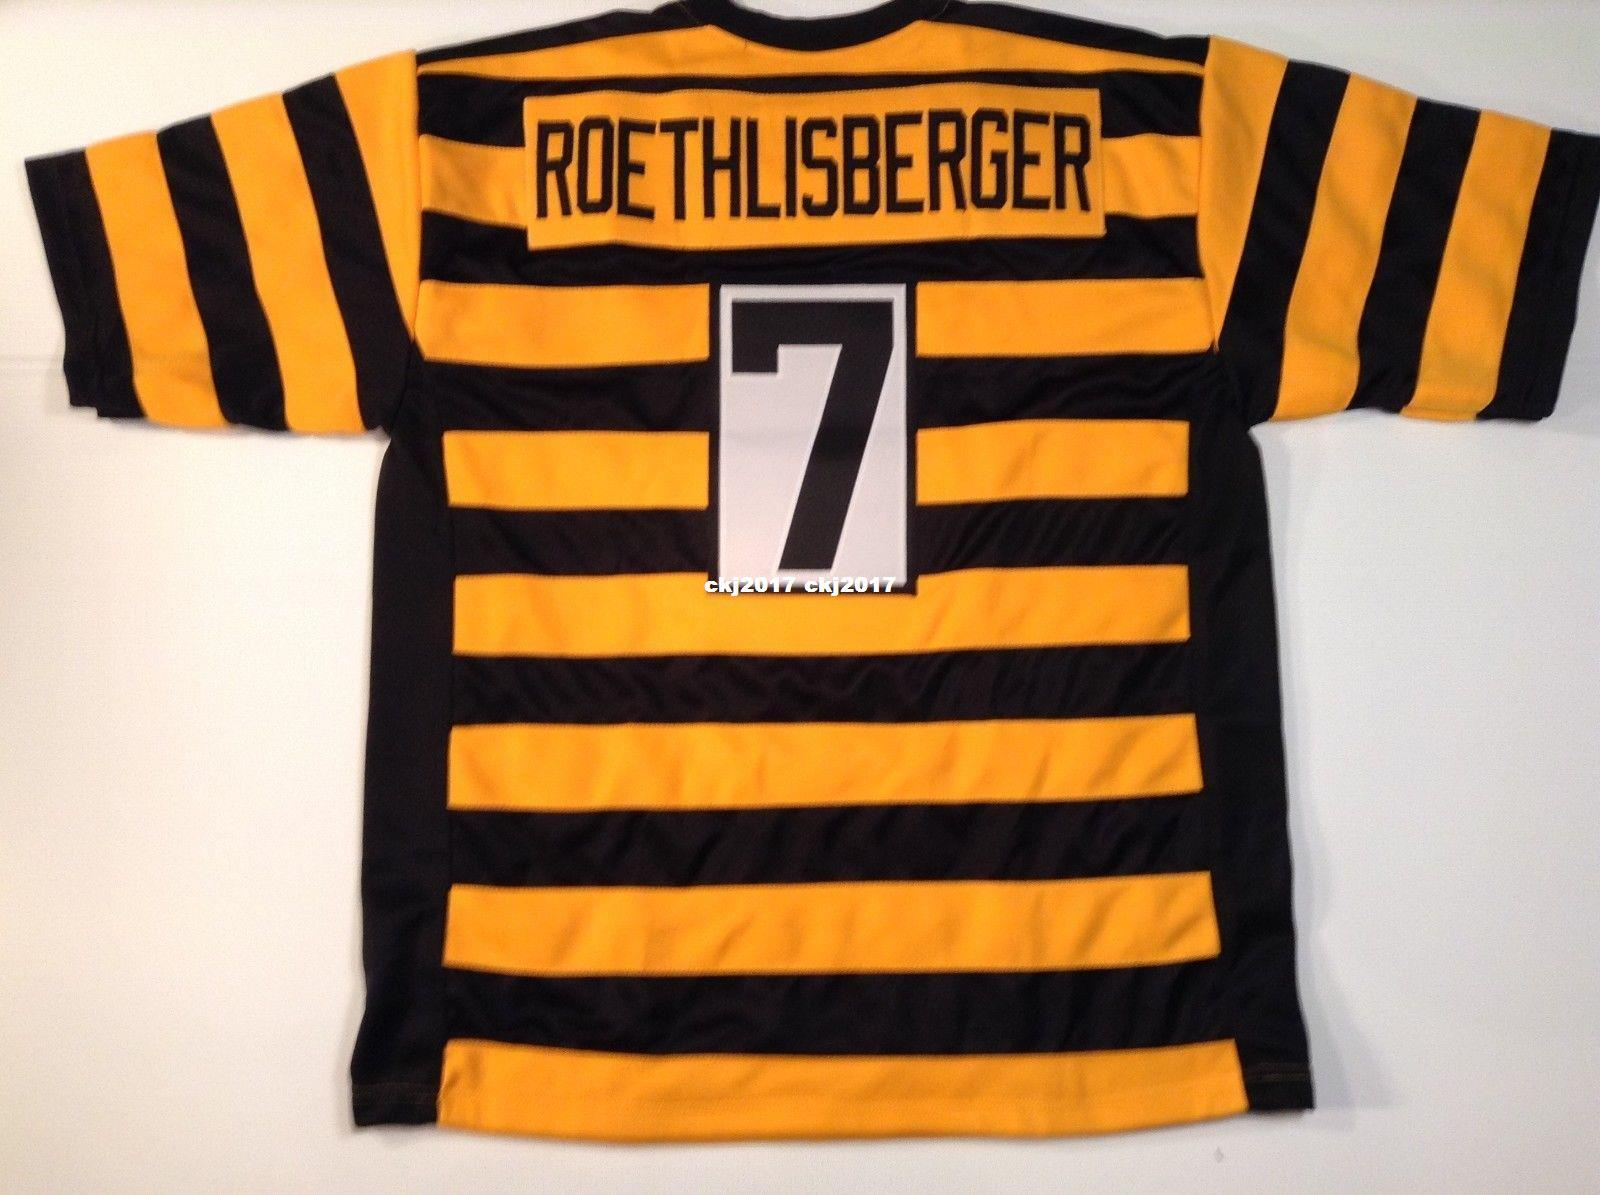 a7d911e47 2019 Cheap Retro Custom Sewn Stitched  7 Ben Roethlisberger ...